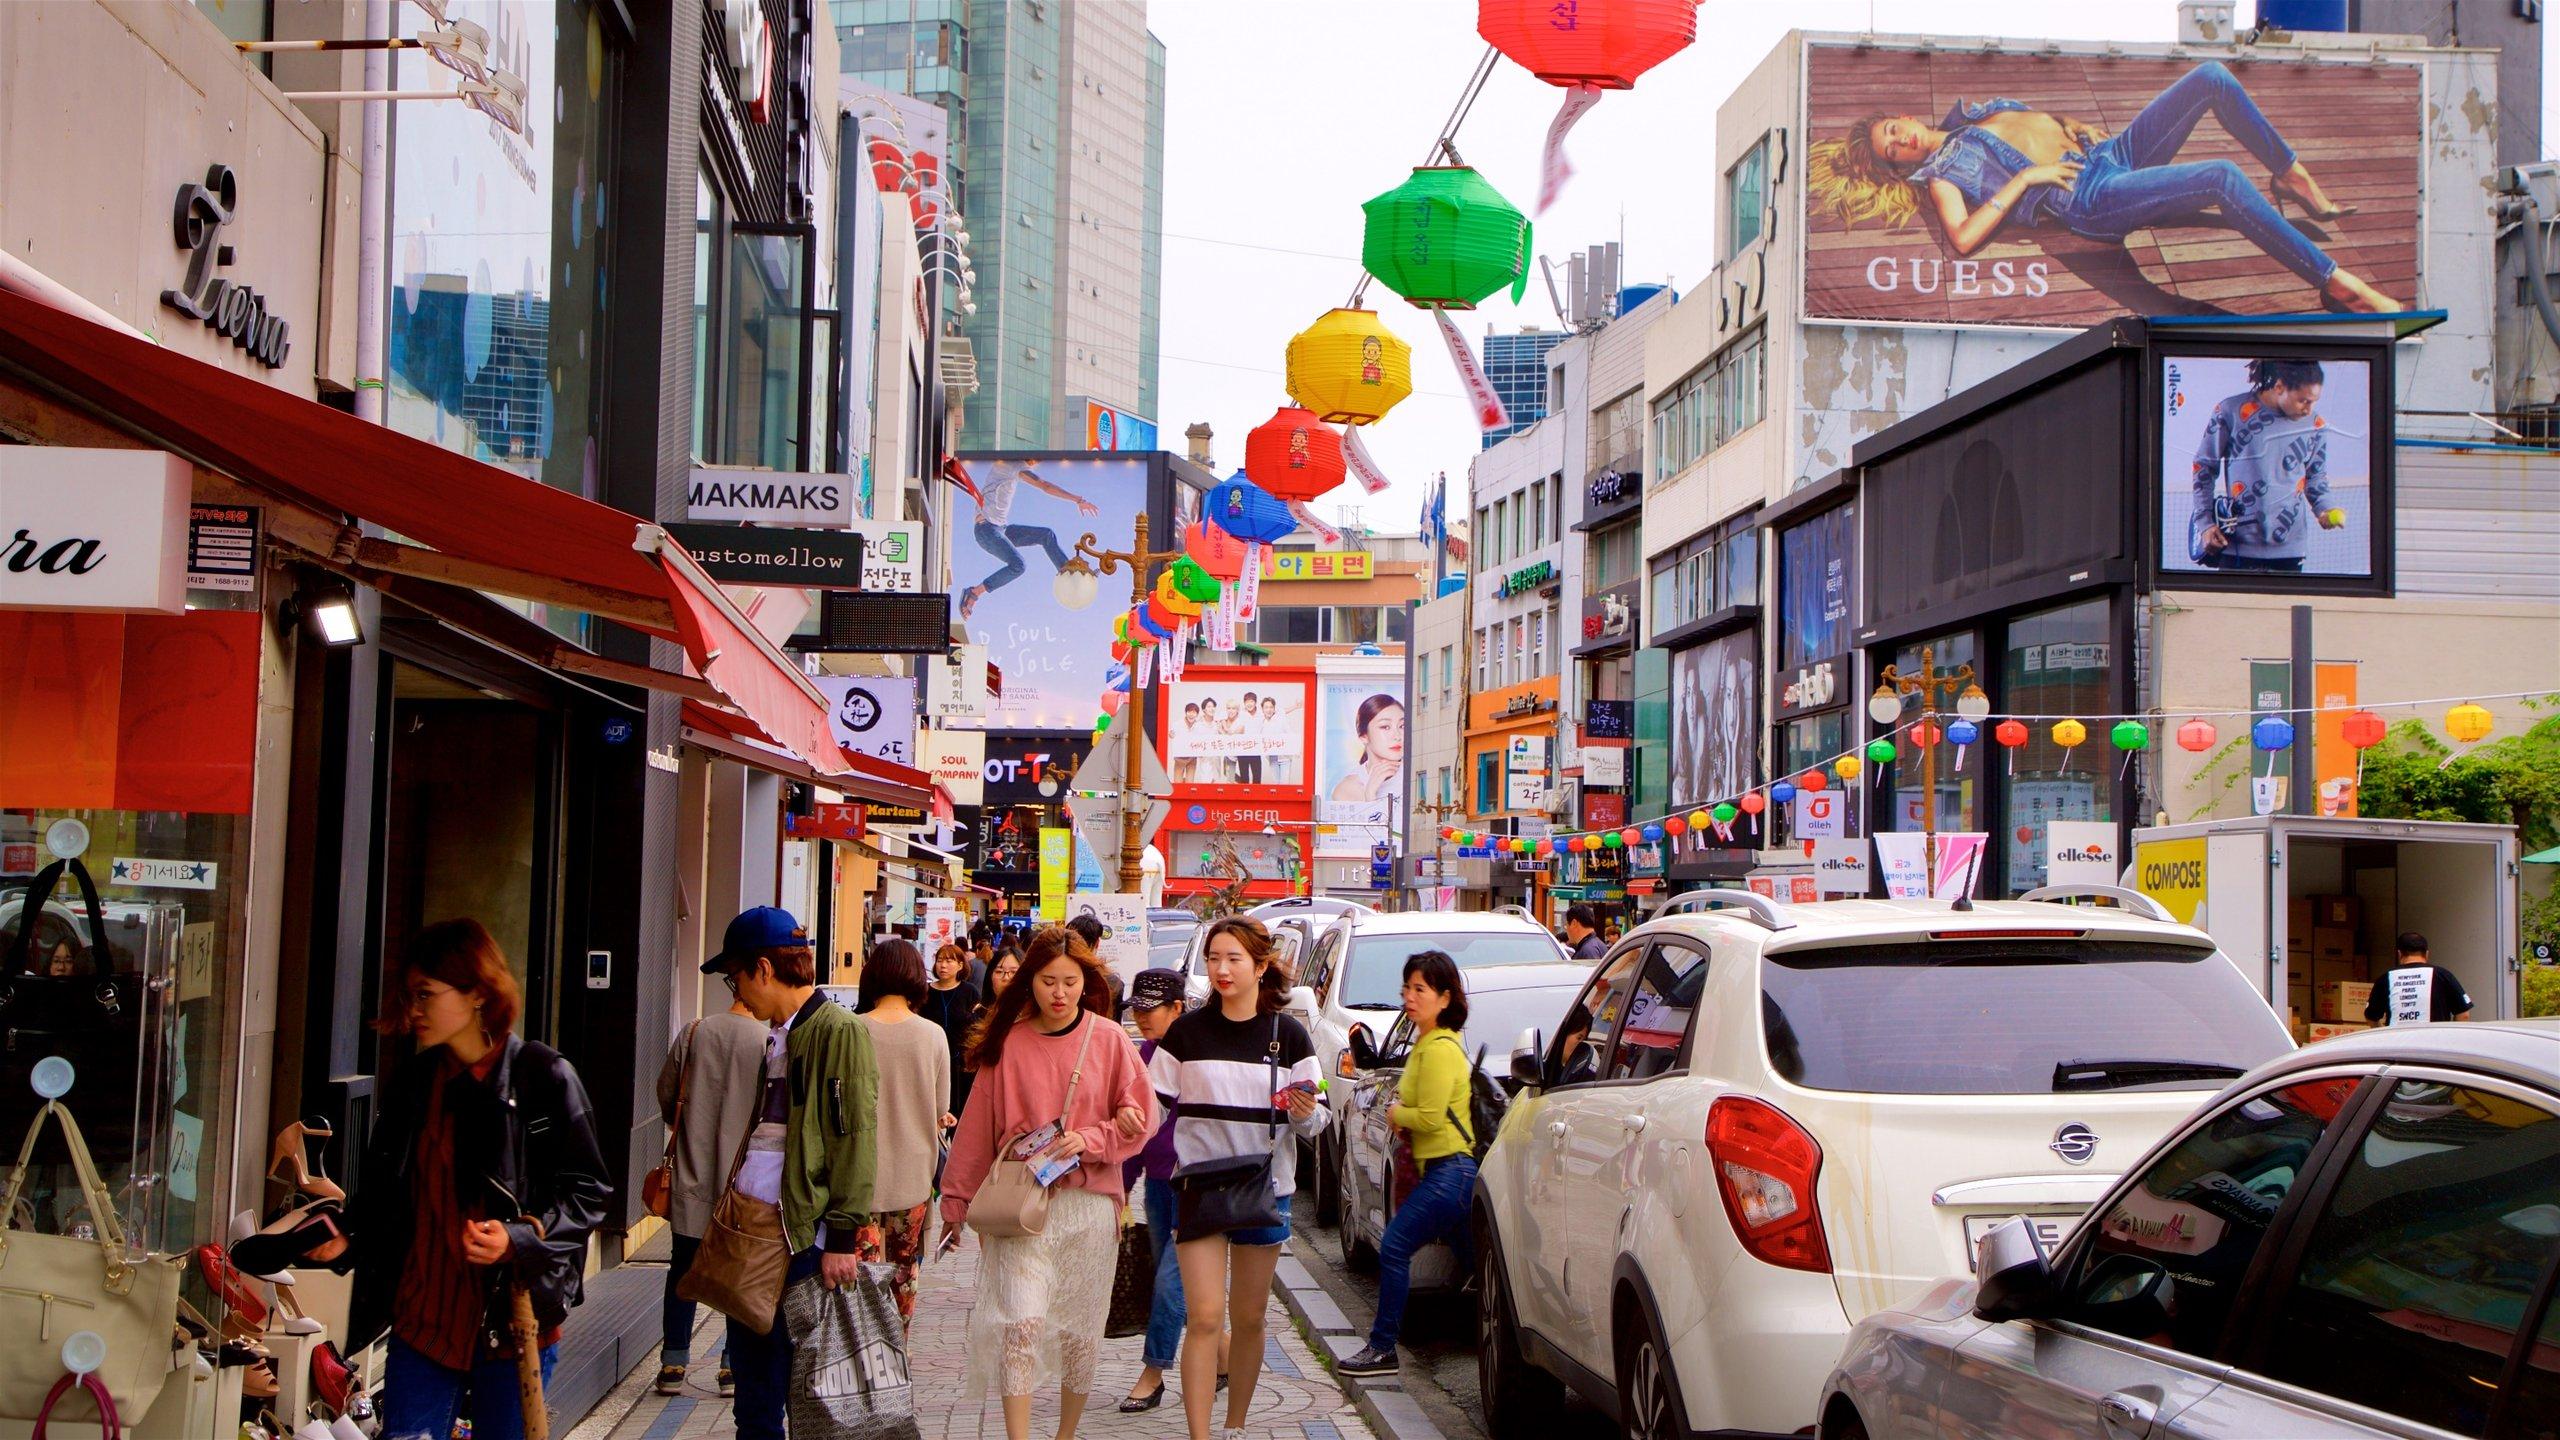 Gwangbok-ro Kultur- og Modegade, Busan, Sydkorea